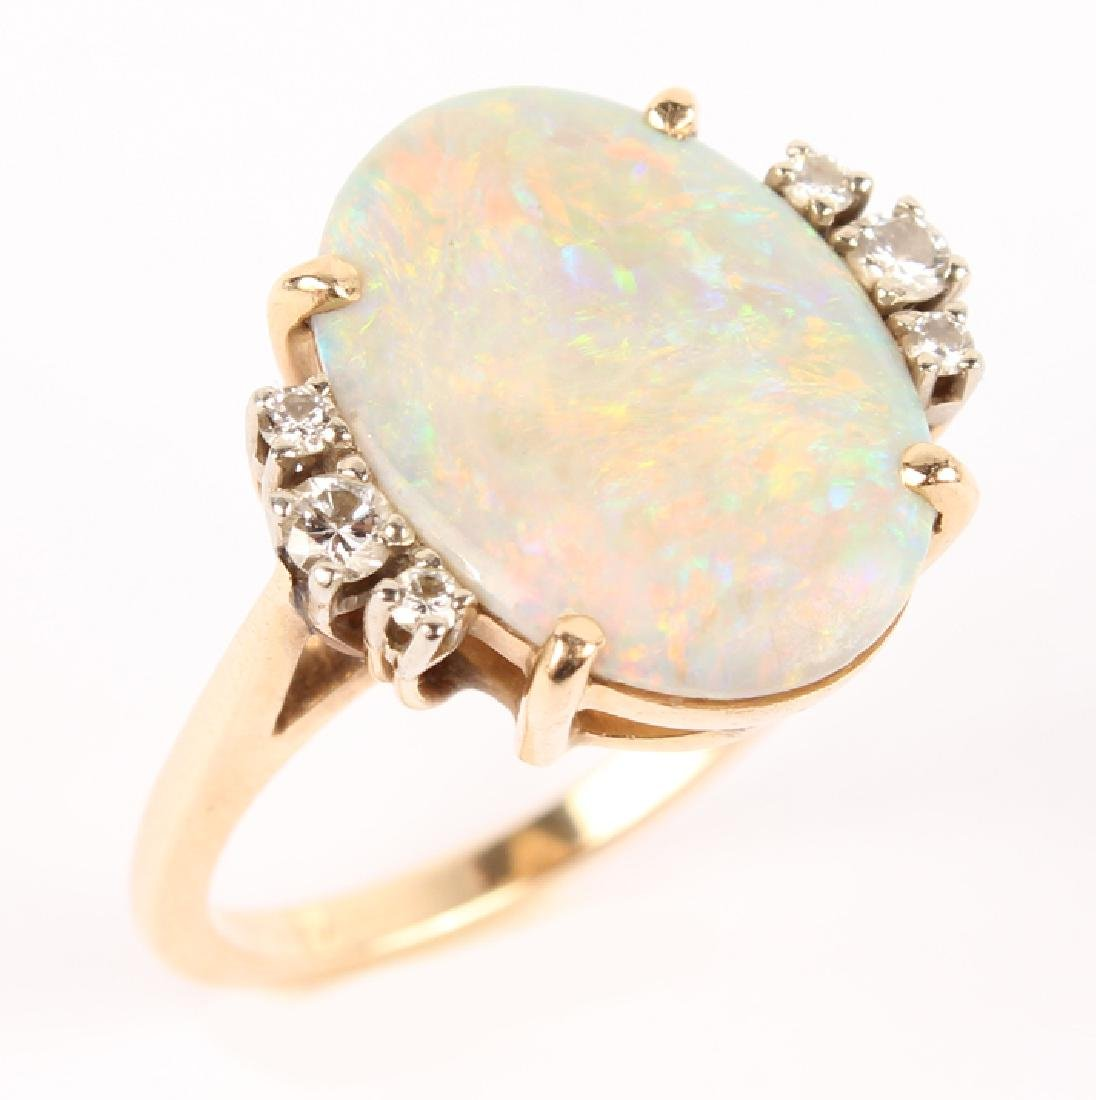 ANTIQUE 14K YELLOW GOLD DIAMOND OPAL RING - 3